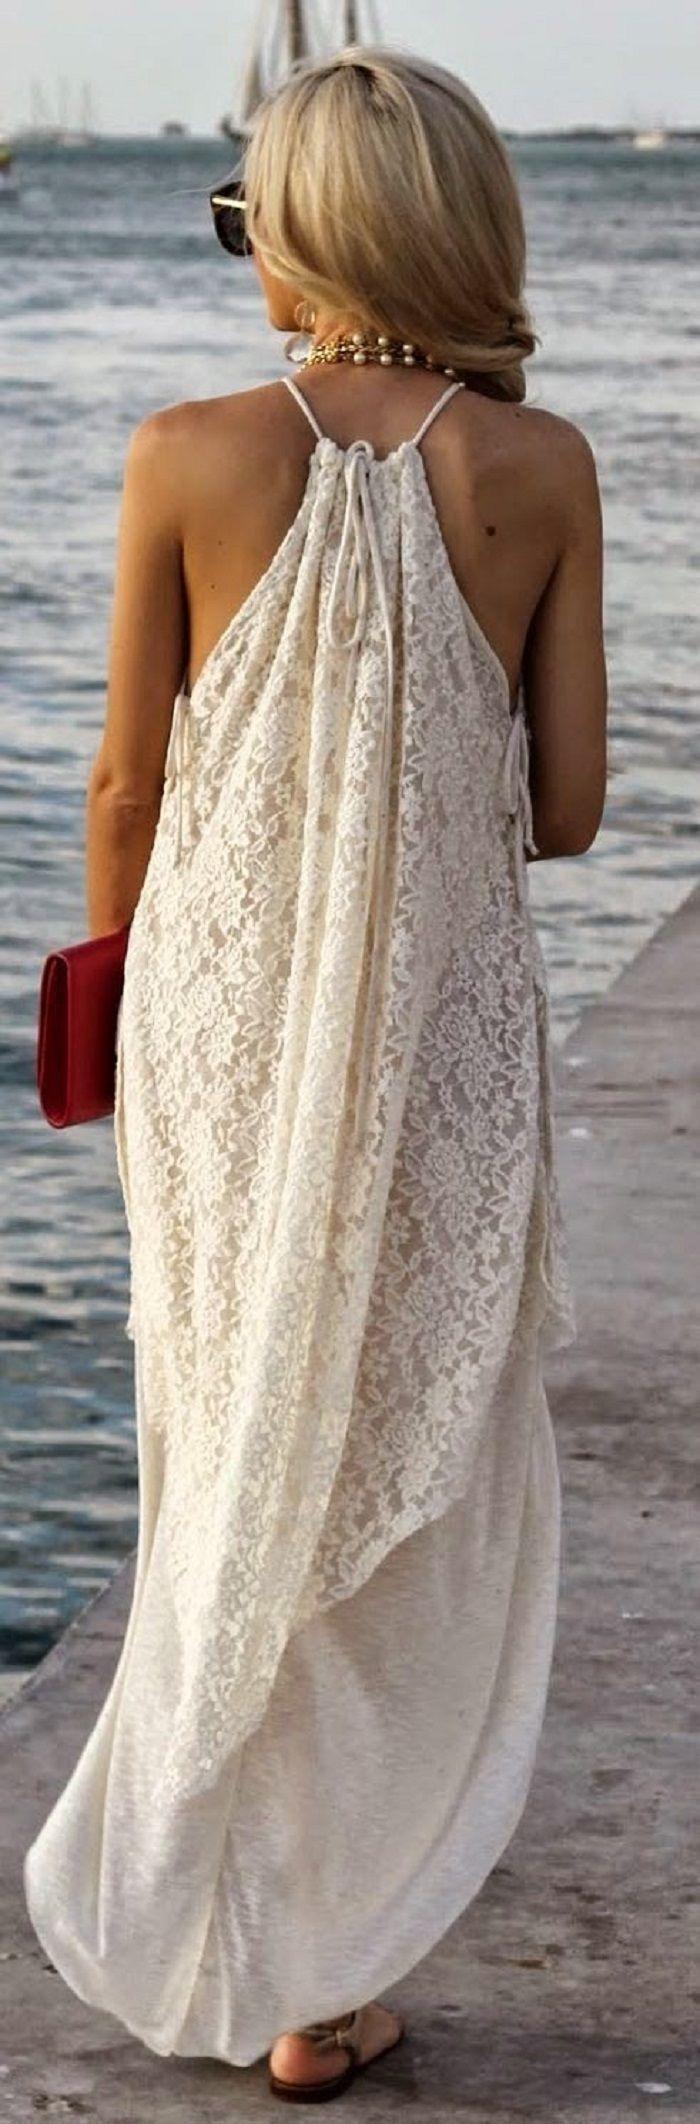 Thin strap lacy long maxi dress #fashion #beautiful #pretty Please follow / repin my pinterest. Also visit my blog http://mutefashion.com/